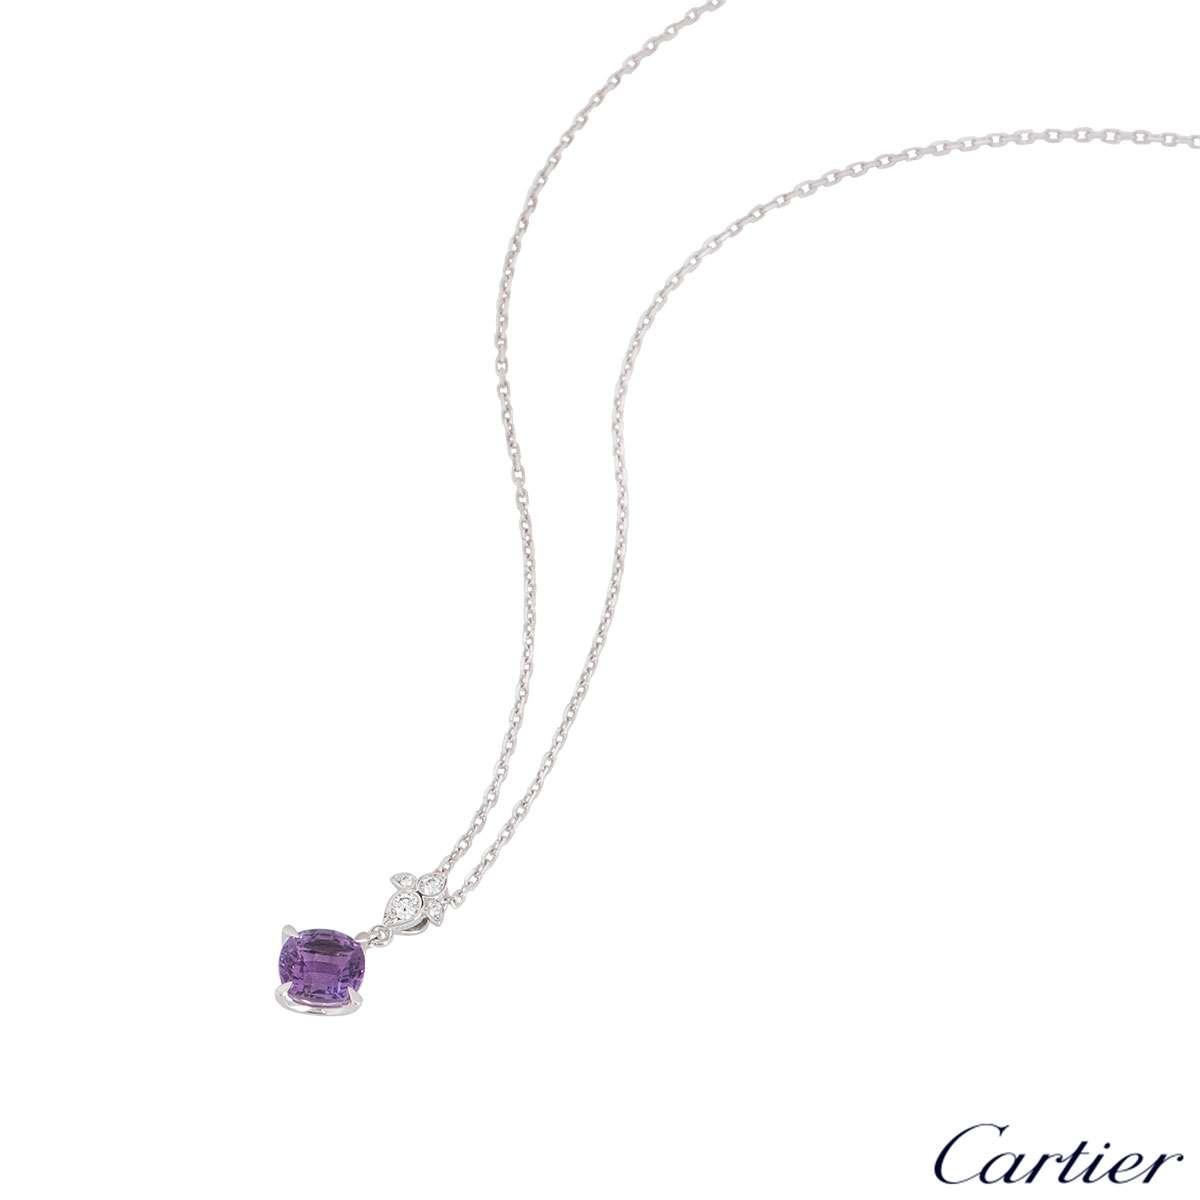 Cartier White Gold Amethyst Lotus Pendant B3041600